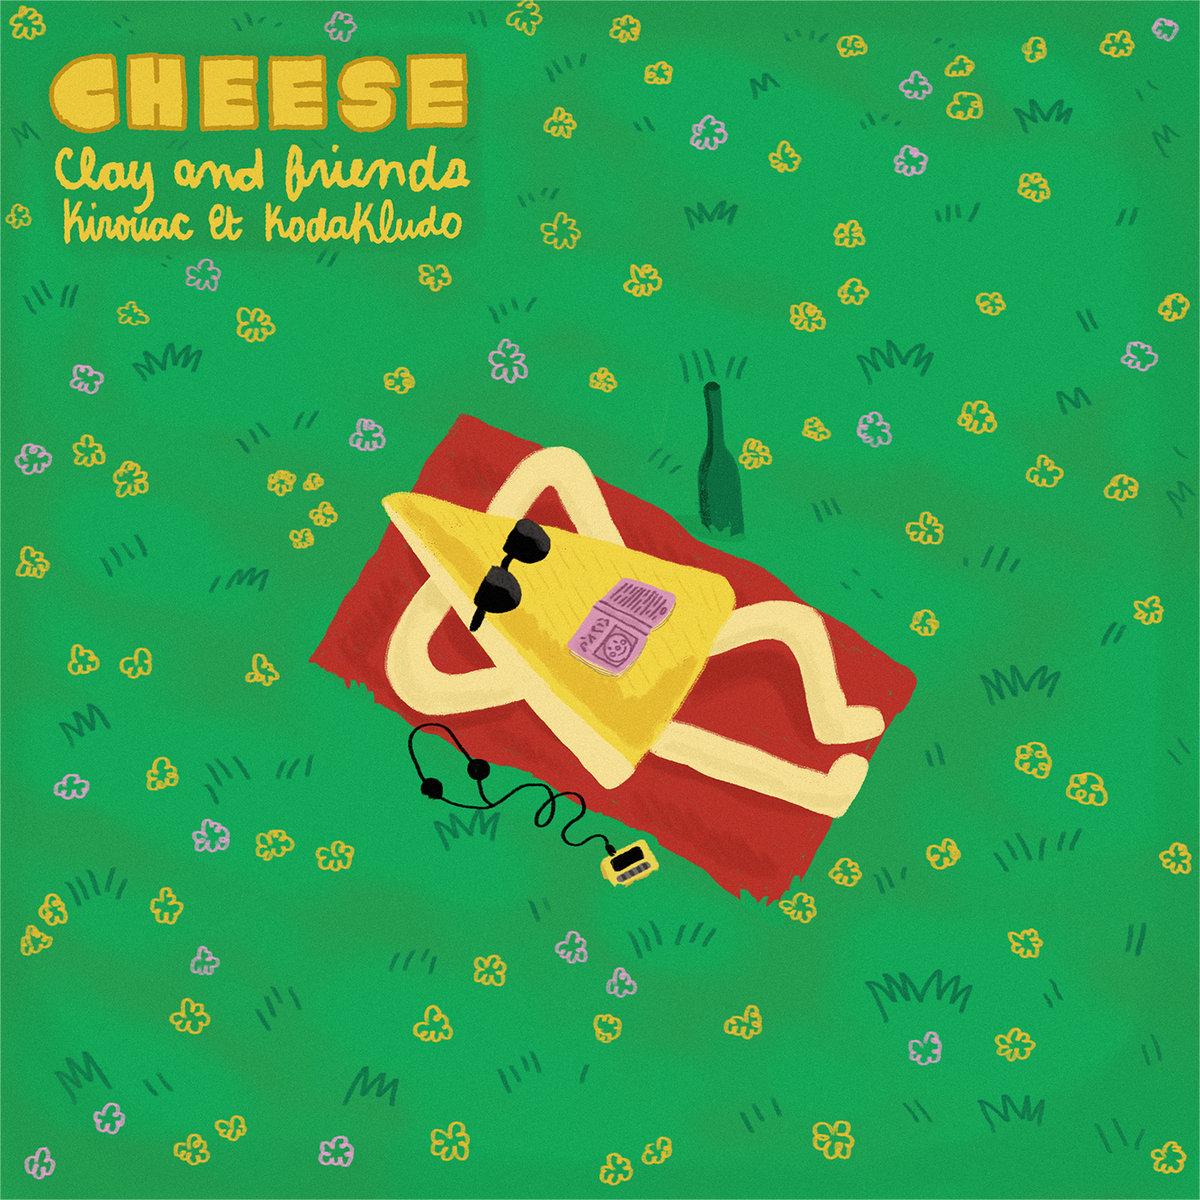 Cheese (ft. Kirouac & Kodakludo)